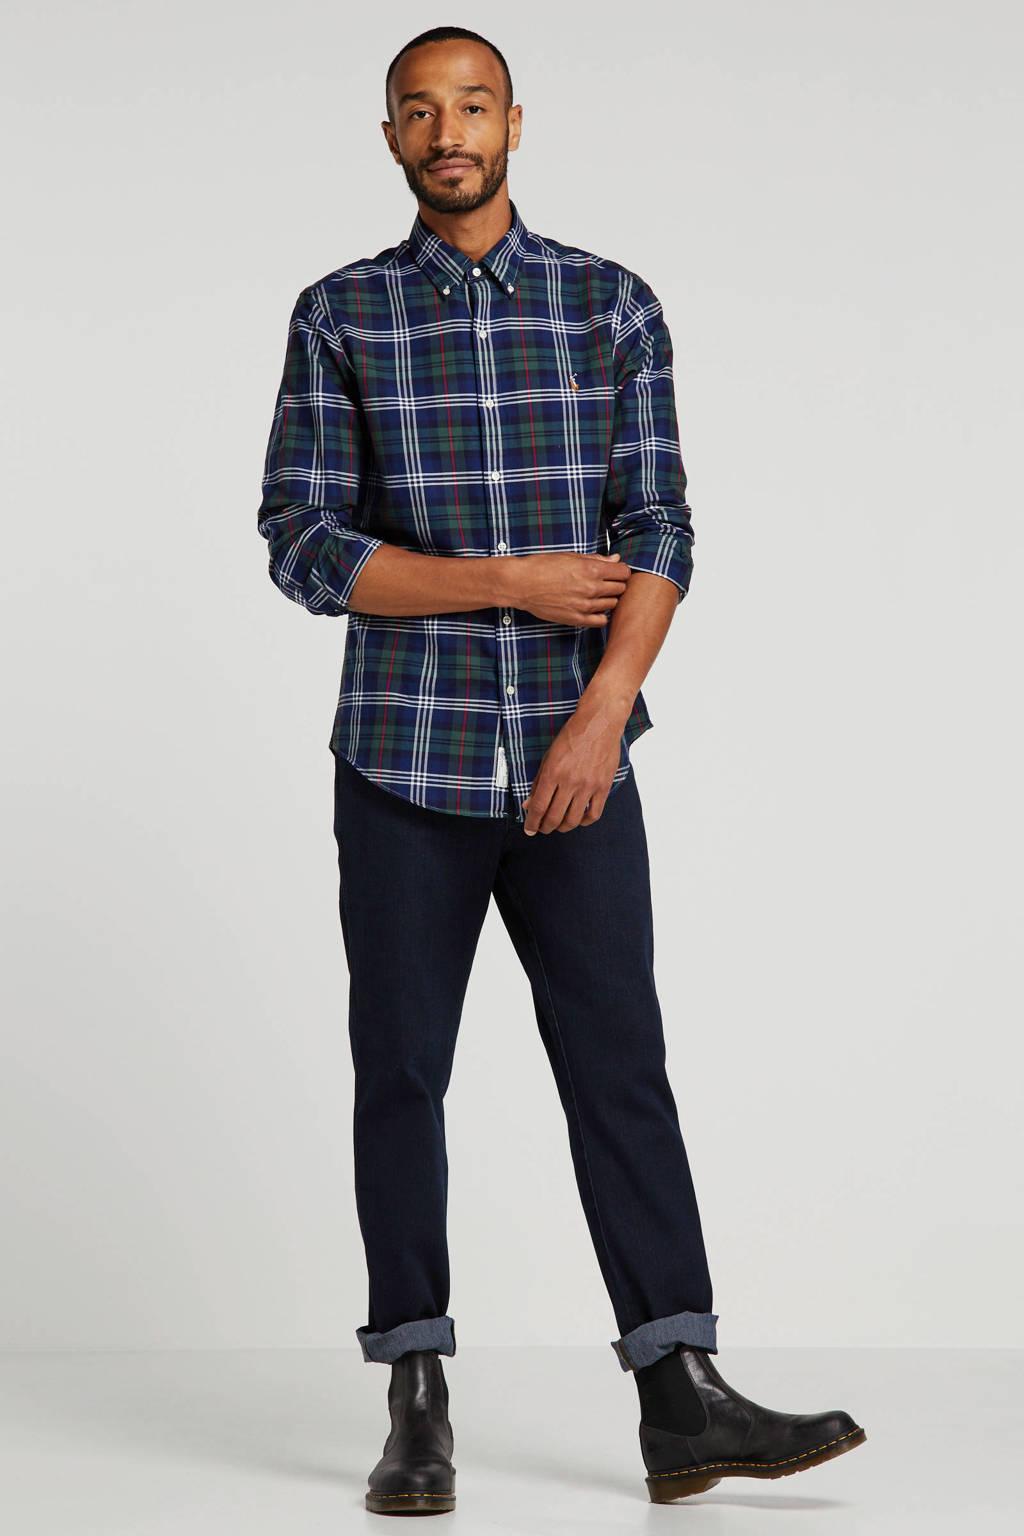 POLO Ralph Lauren geruit slim fit overhemd groen/blauw/rood/wit, Groen/blauw/rood/wit